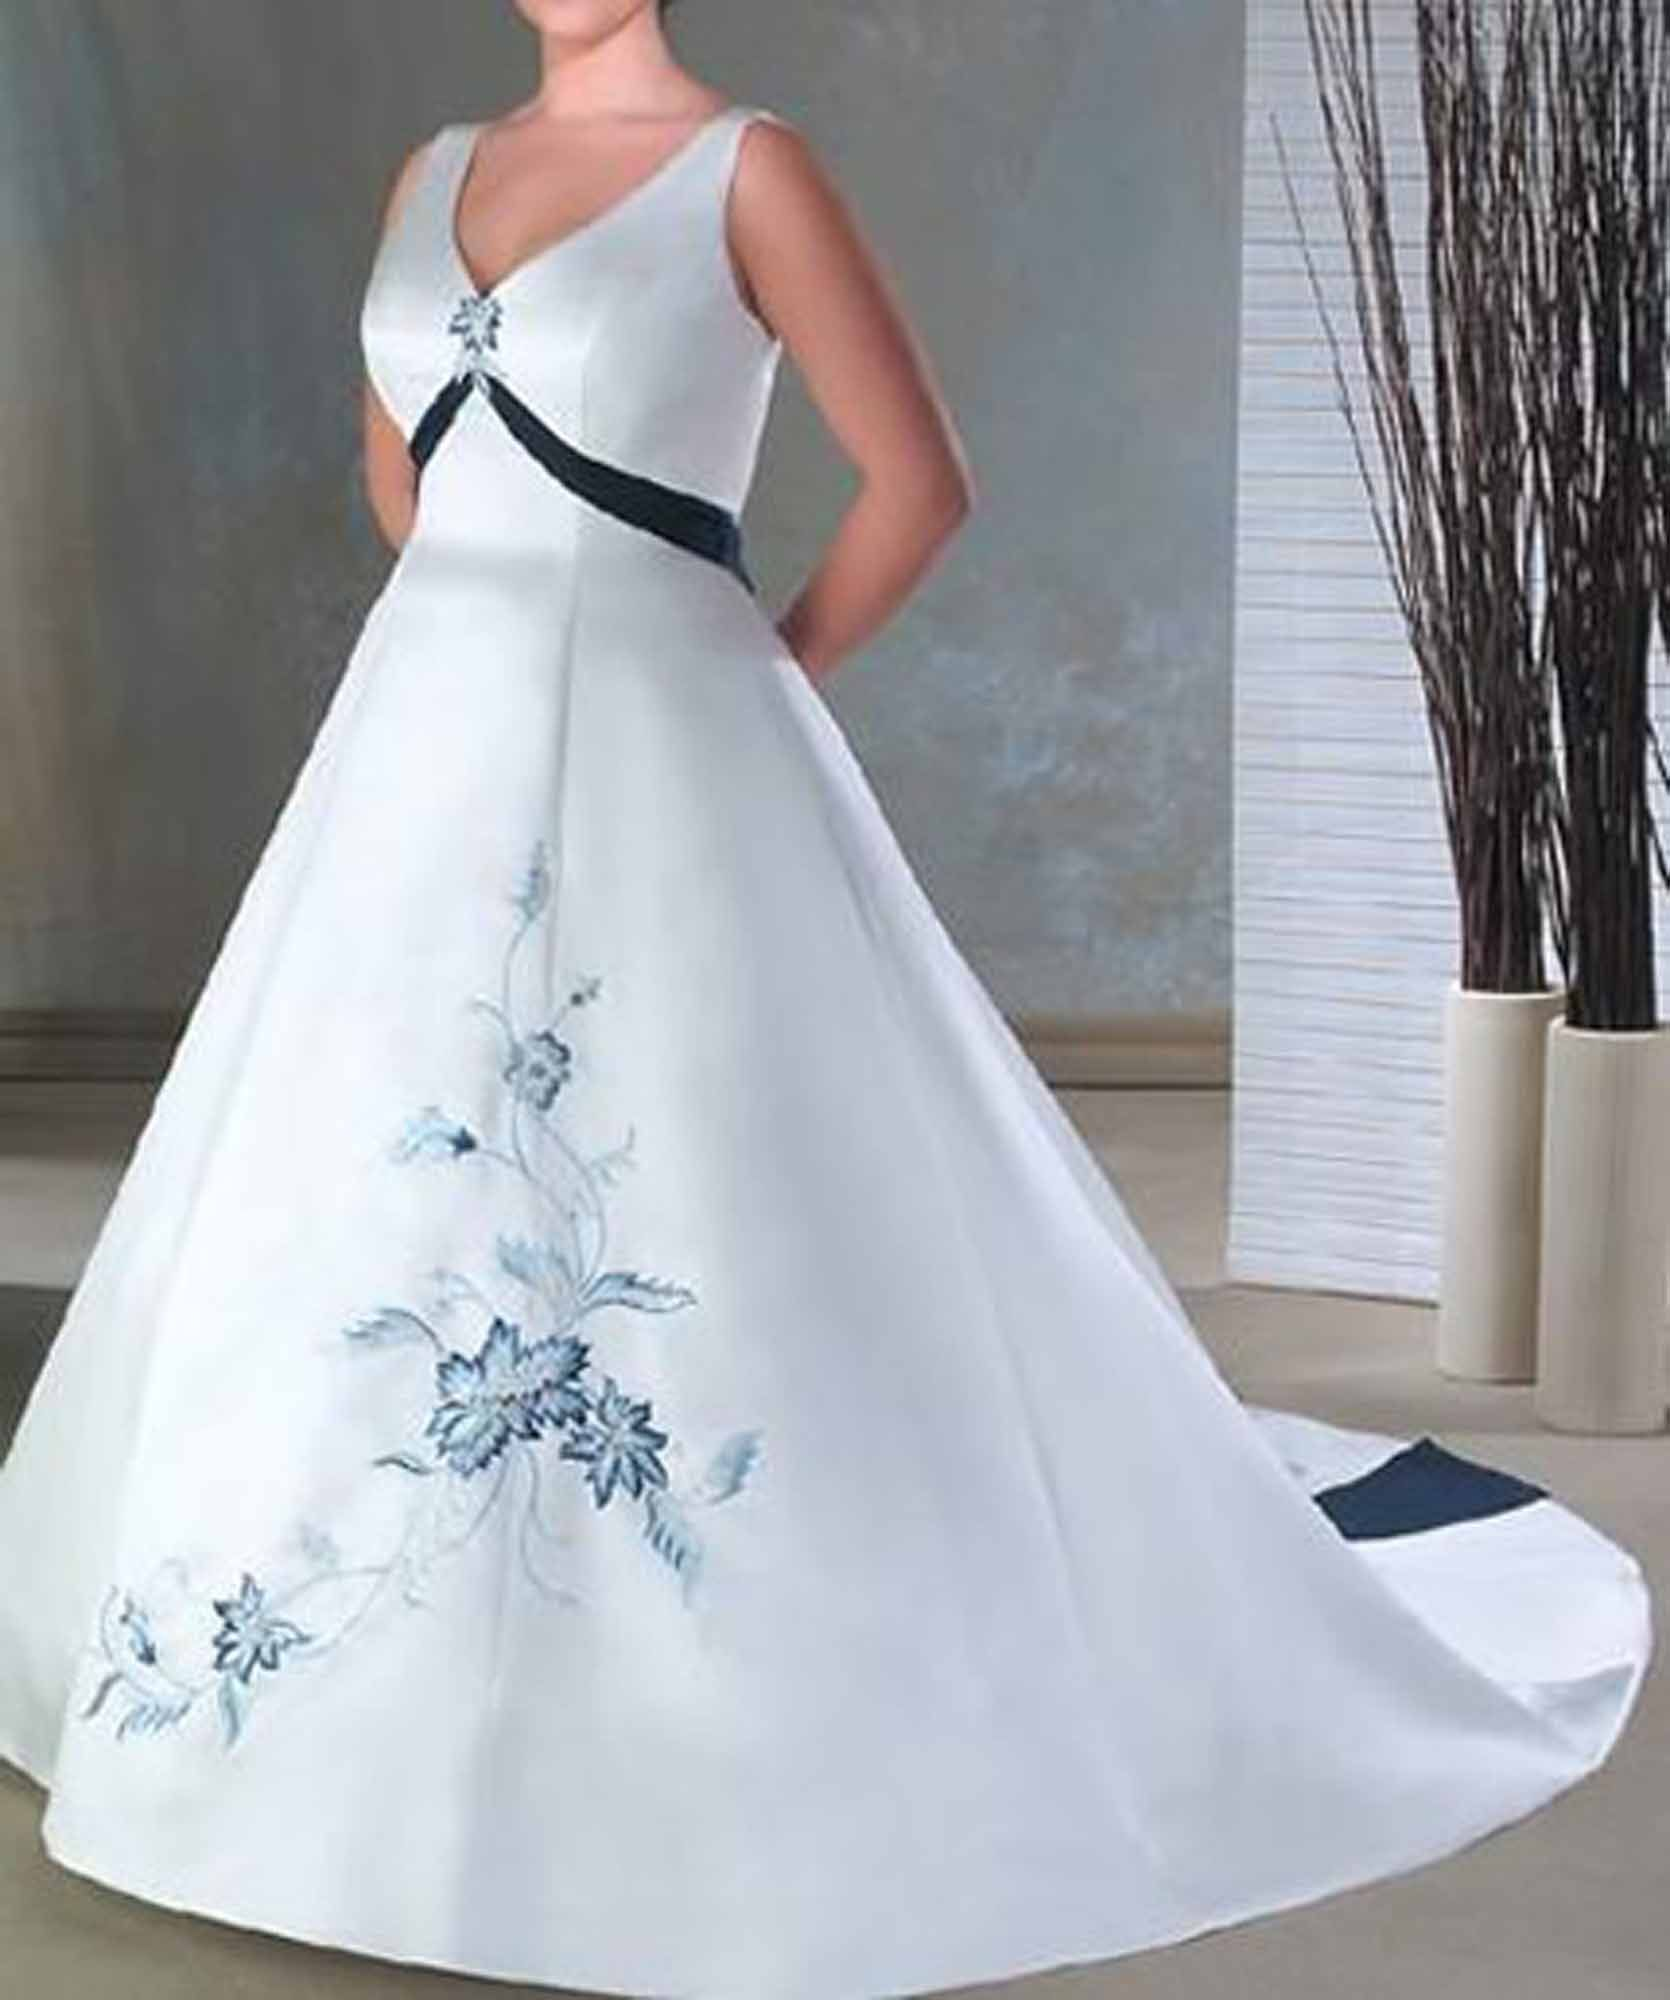 Image from http://hillsweddingdress.xyz/img/simple-civil-wedding ...